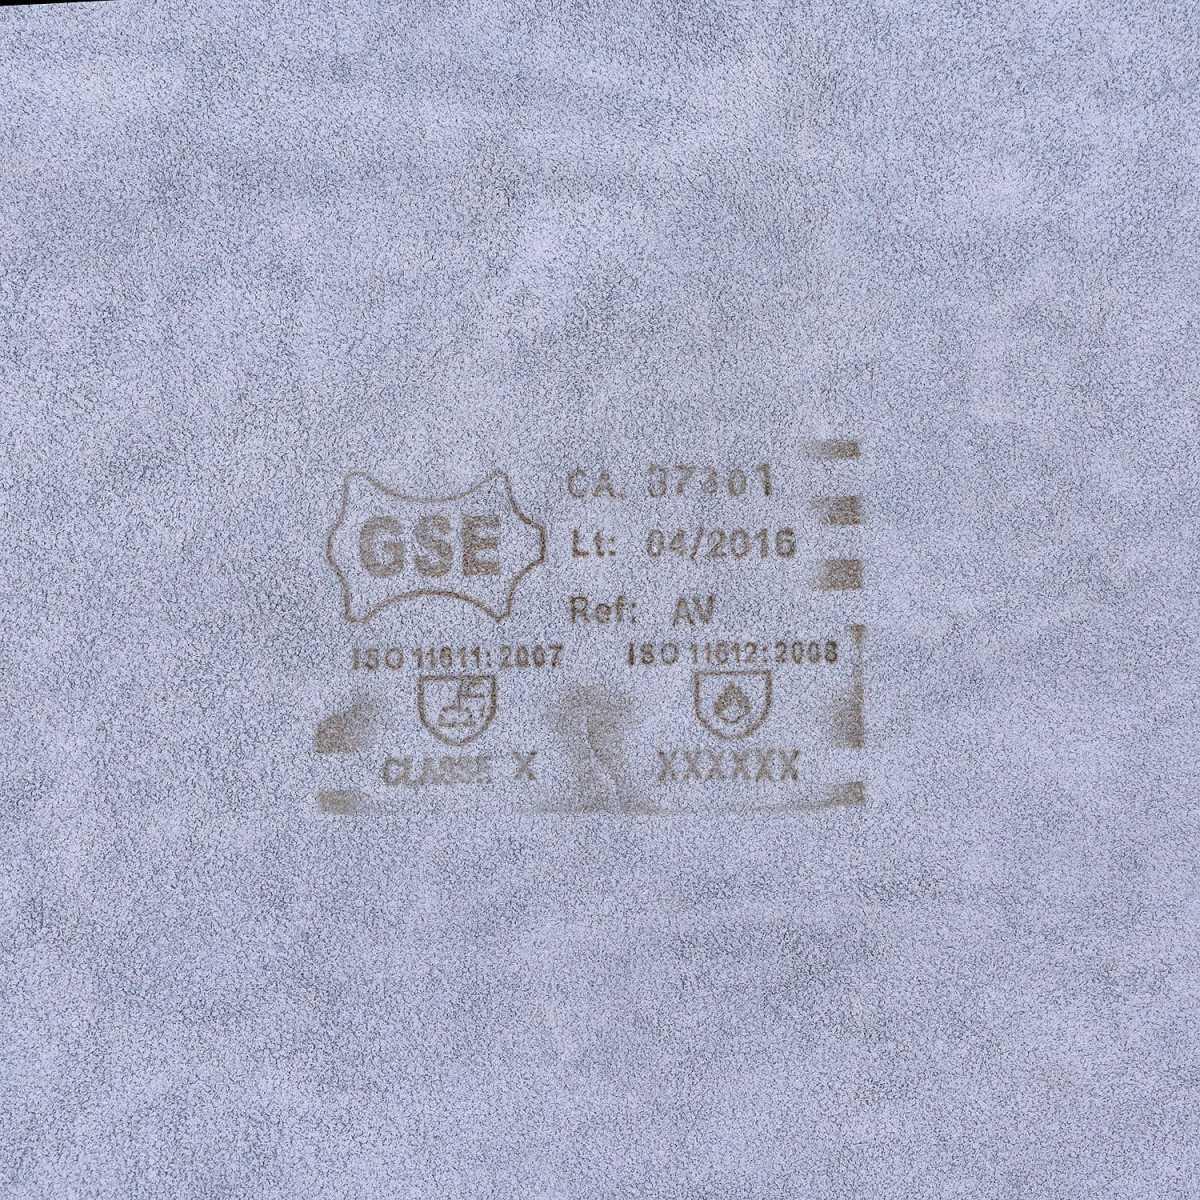 Avental Raspa sem Emenda de 1,00 X 0,60 Gse